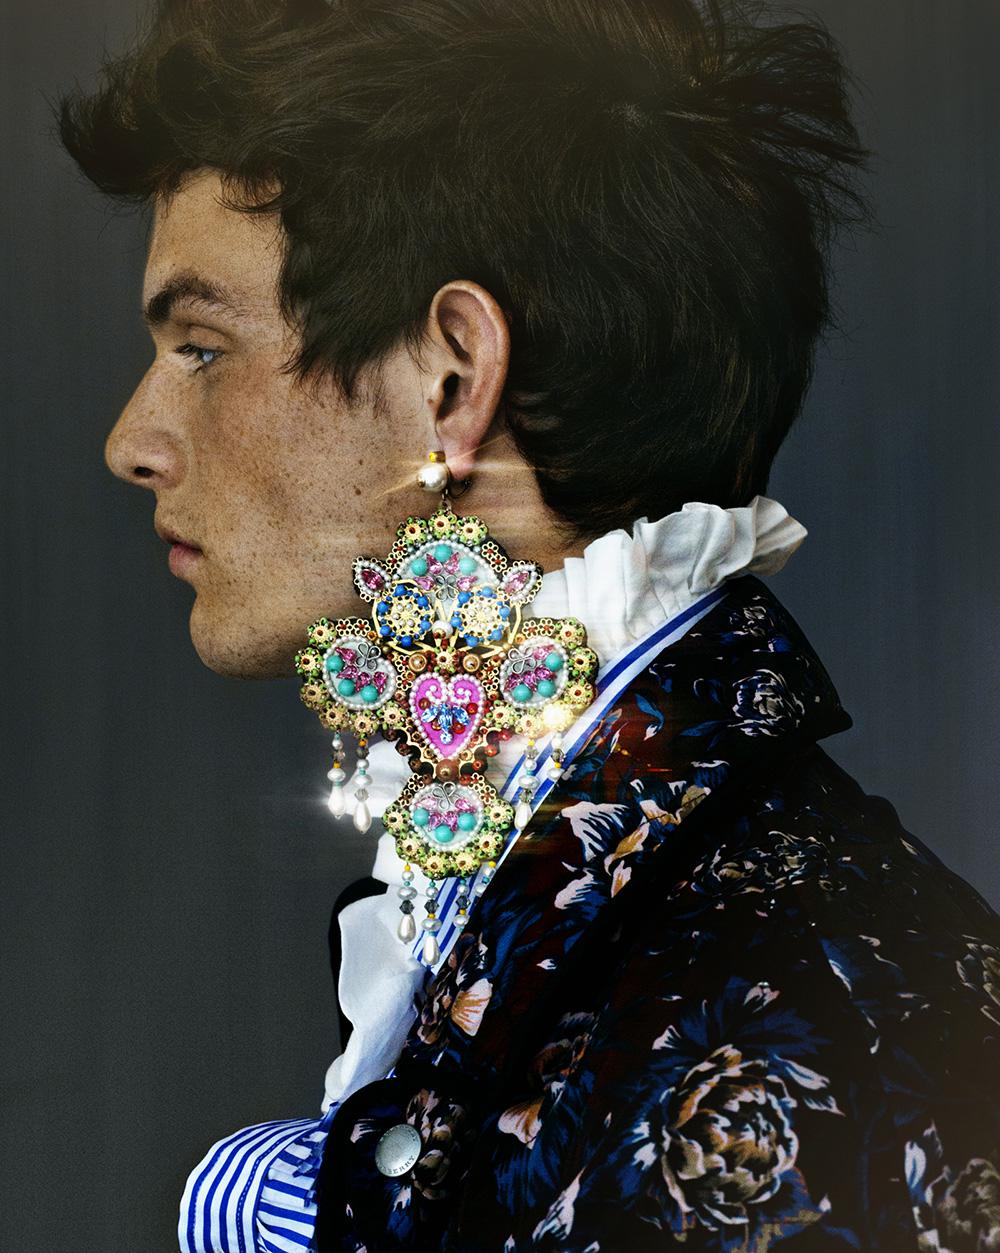 Earring Gucci, shirt & coat Burberry